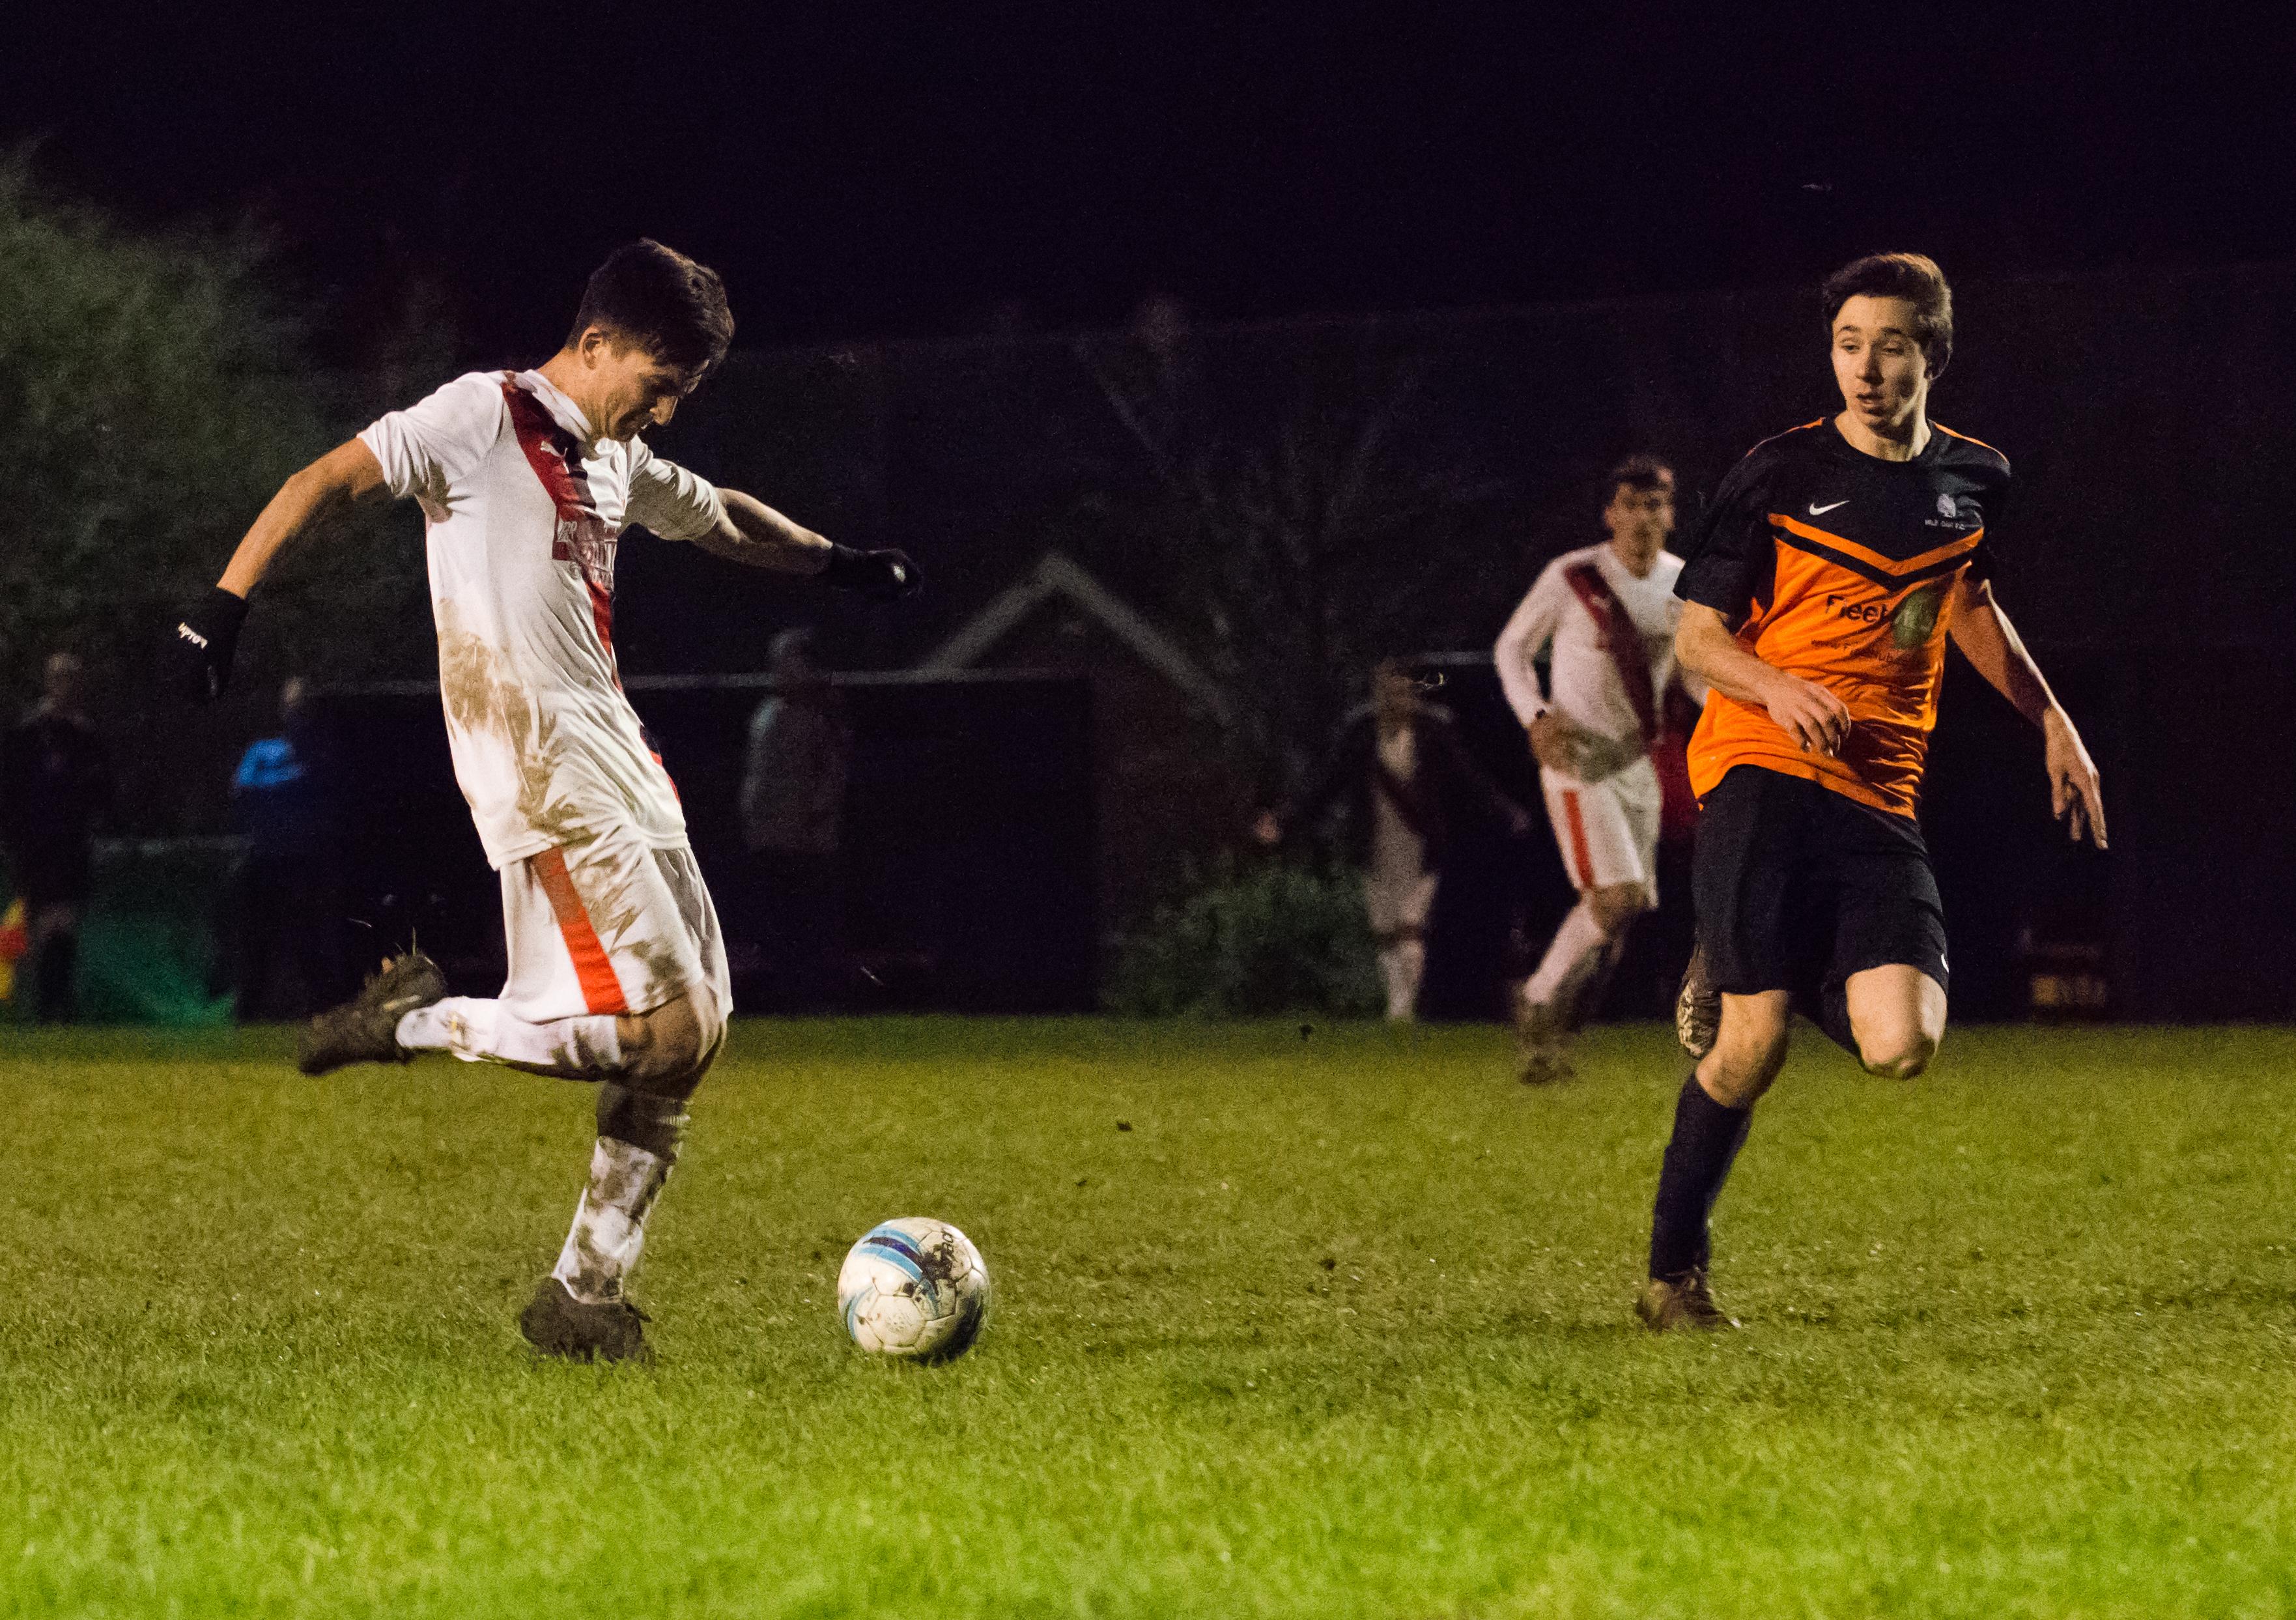 Mile Oak U21s vs Southwick FC U21s 14.12.17 45